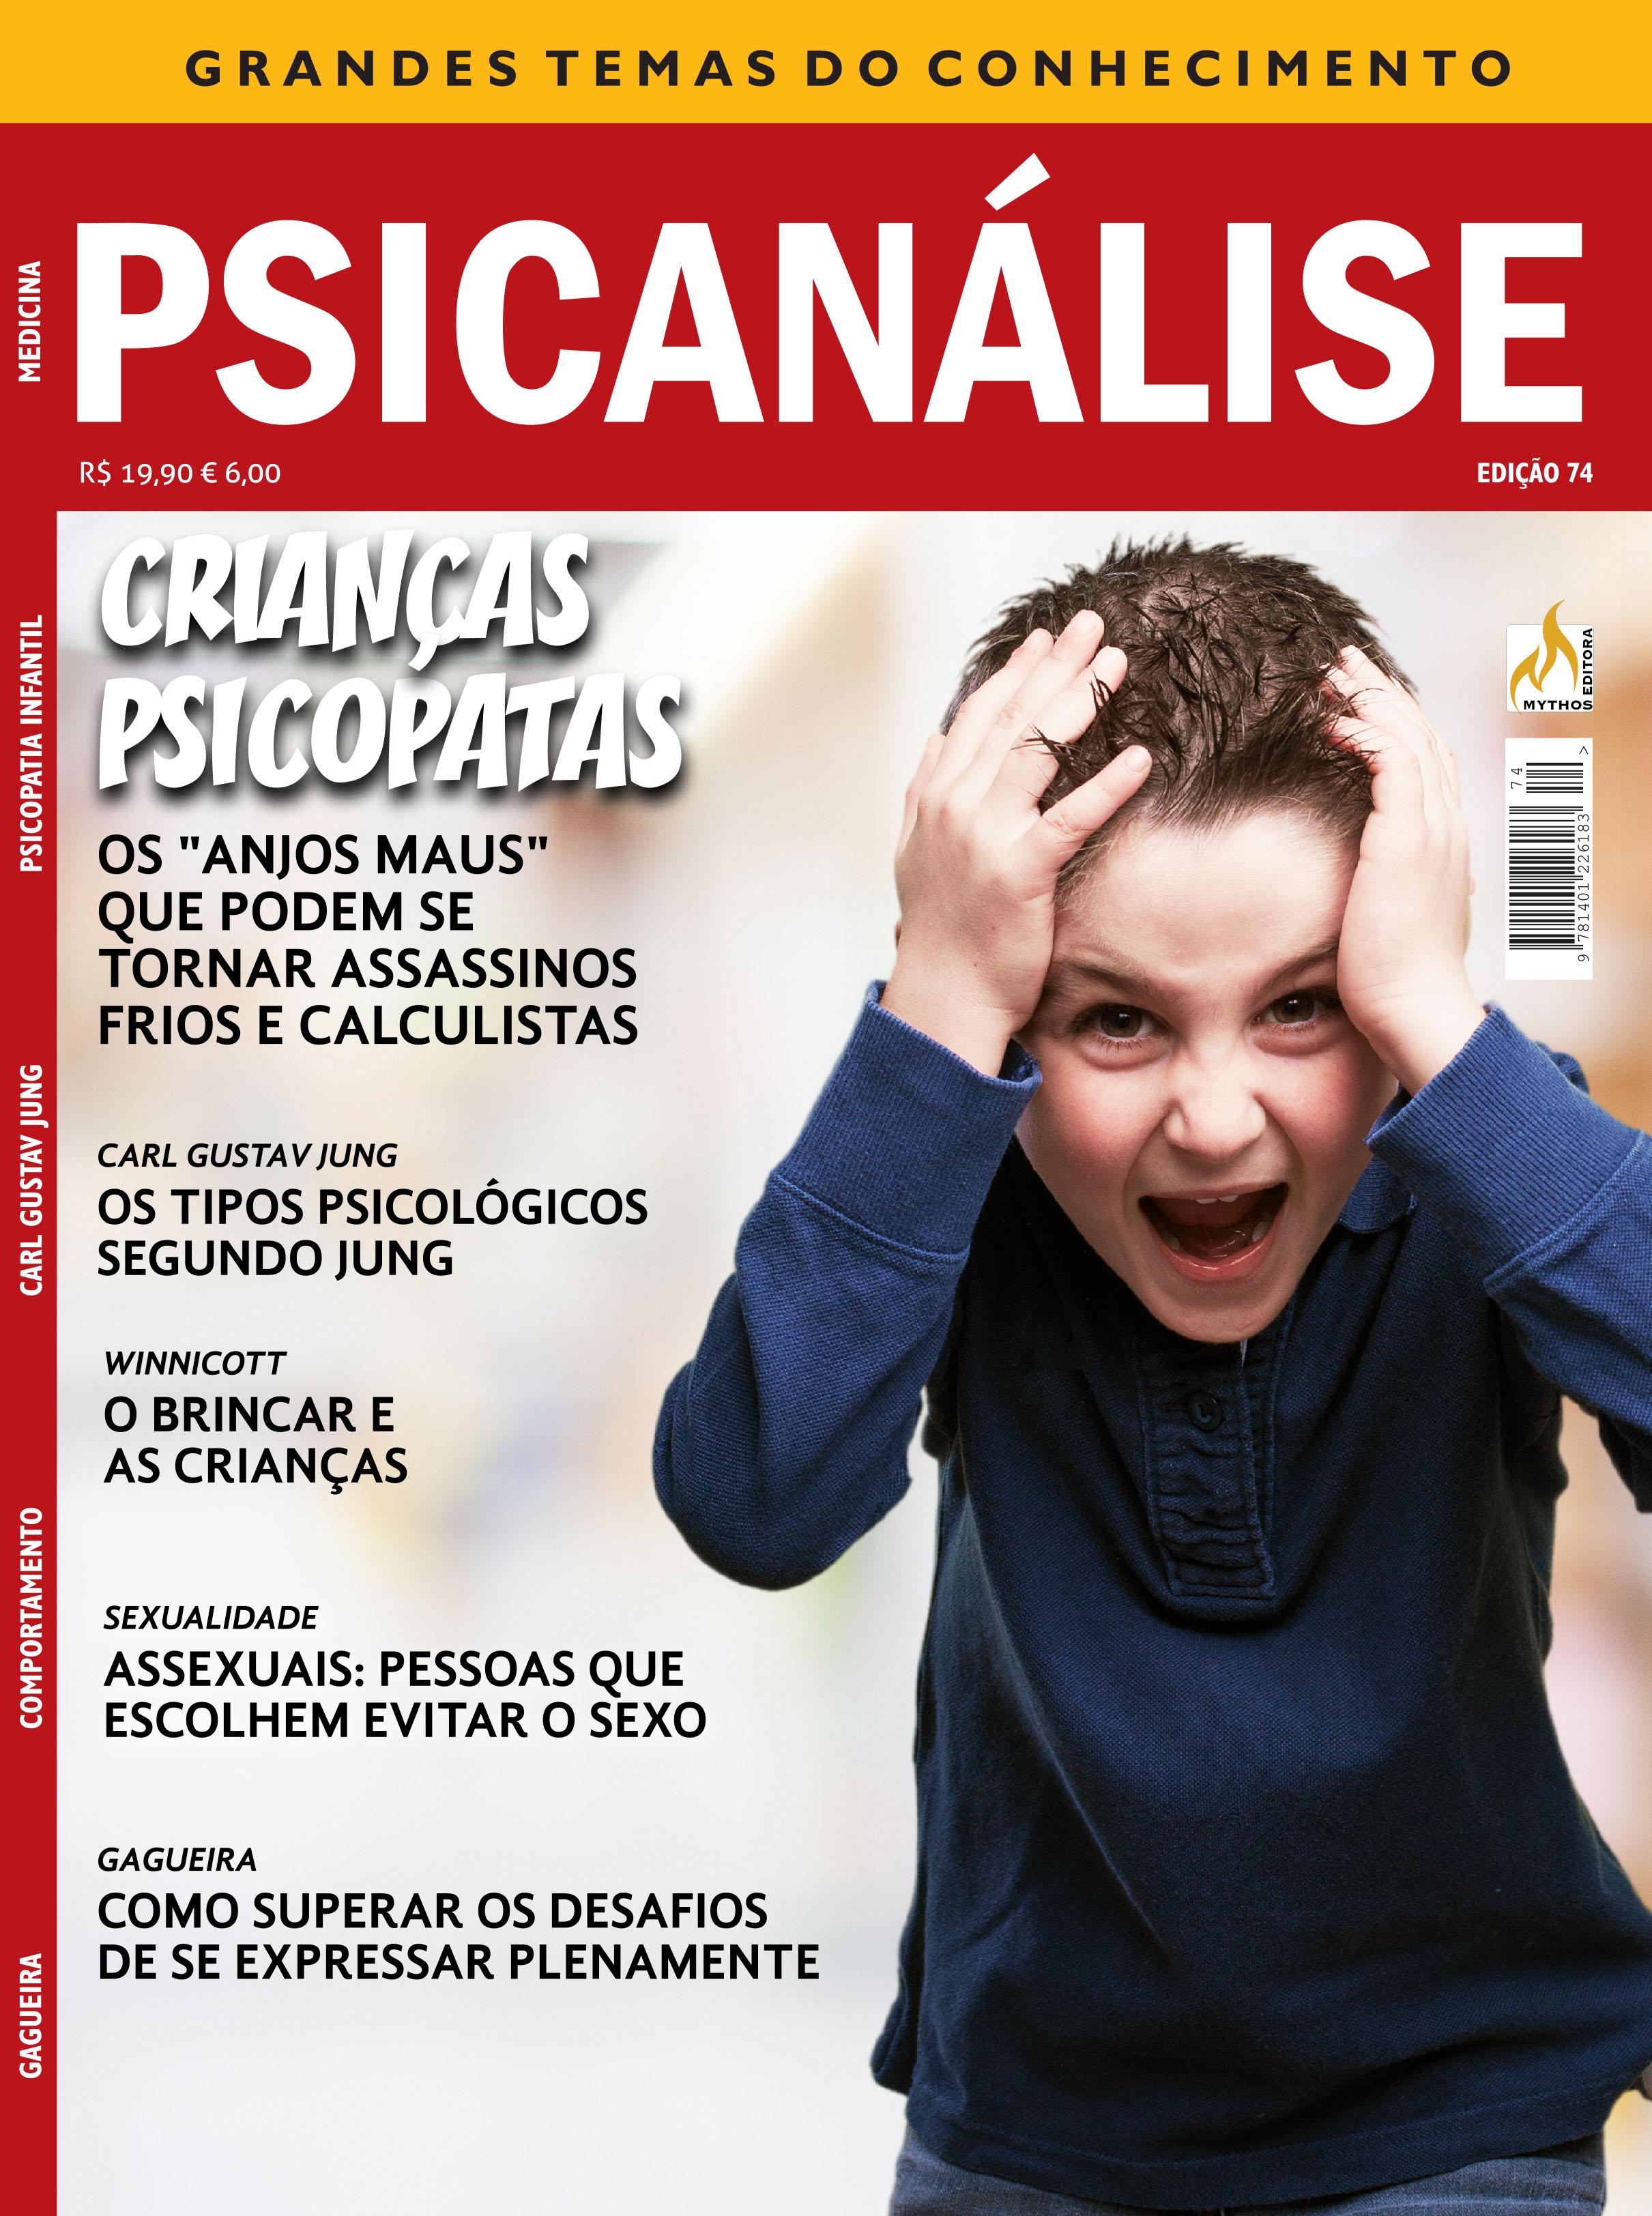 PSICANÁLISE Nº 074